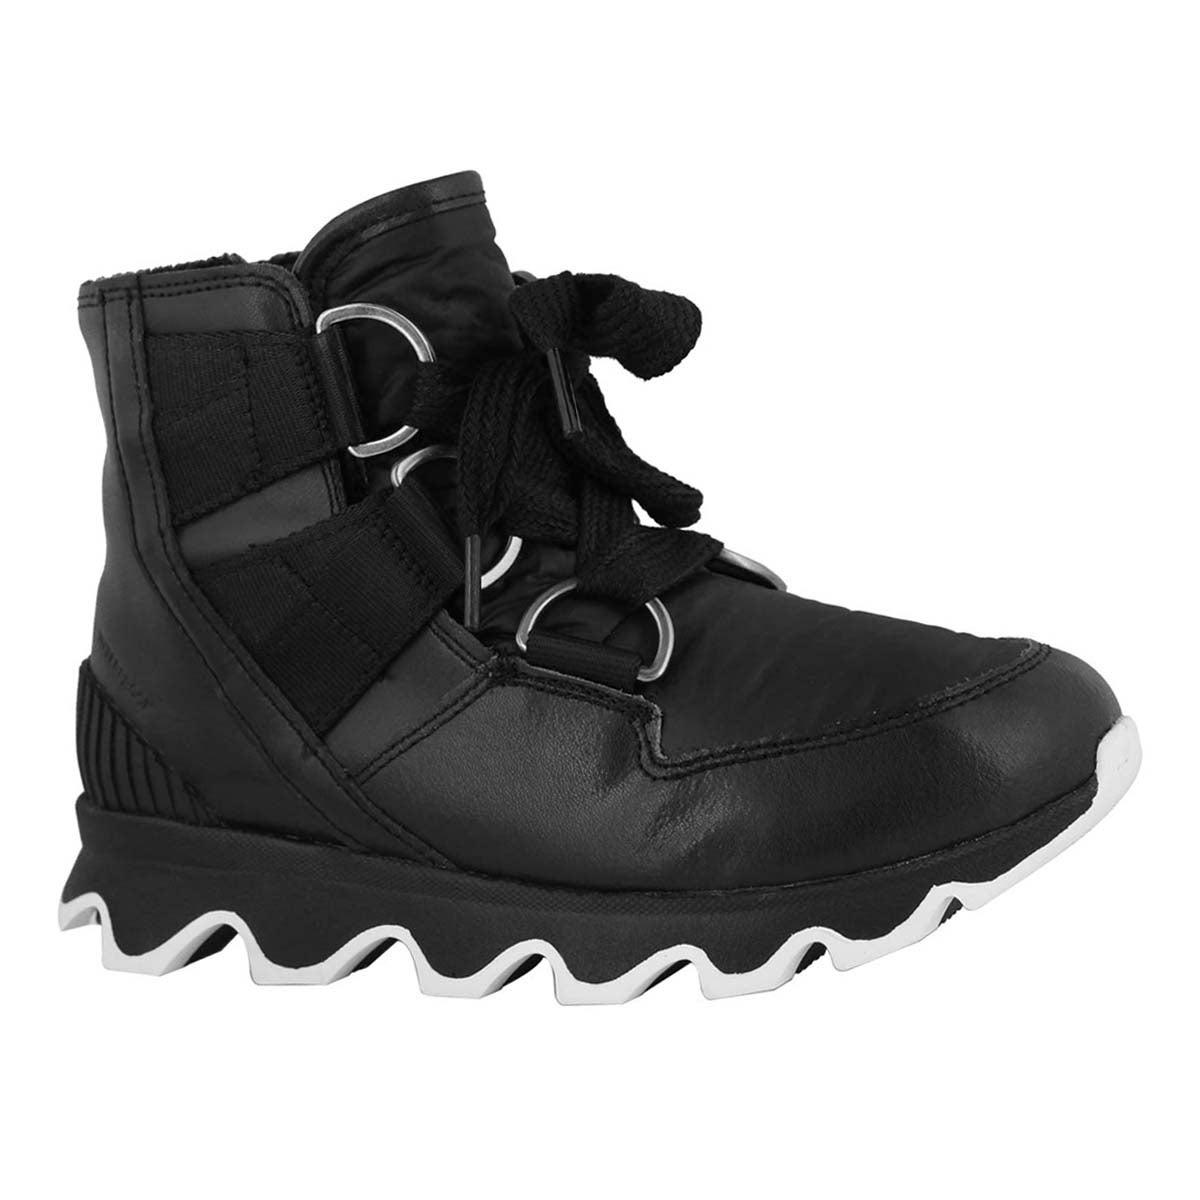 Lds Kinetic Short Lace bk/wt wtrpf boot